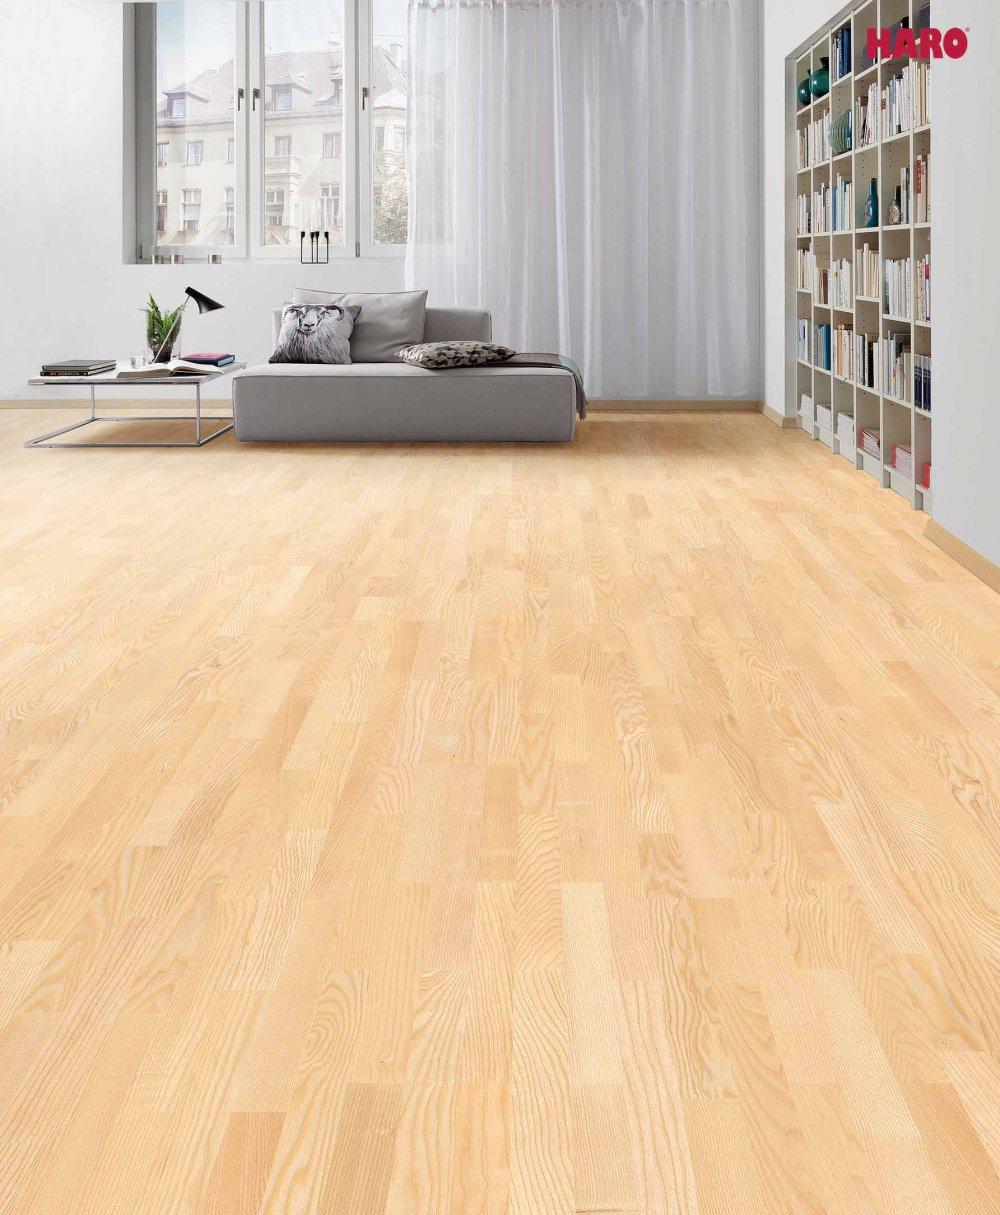 524642 haro parkett 3 stab schiffsboden 4000 esche trend lackiert. Black Bedroom Furniture Sets. Home Design Ideas